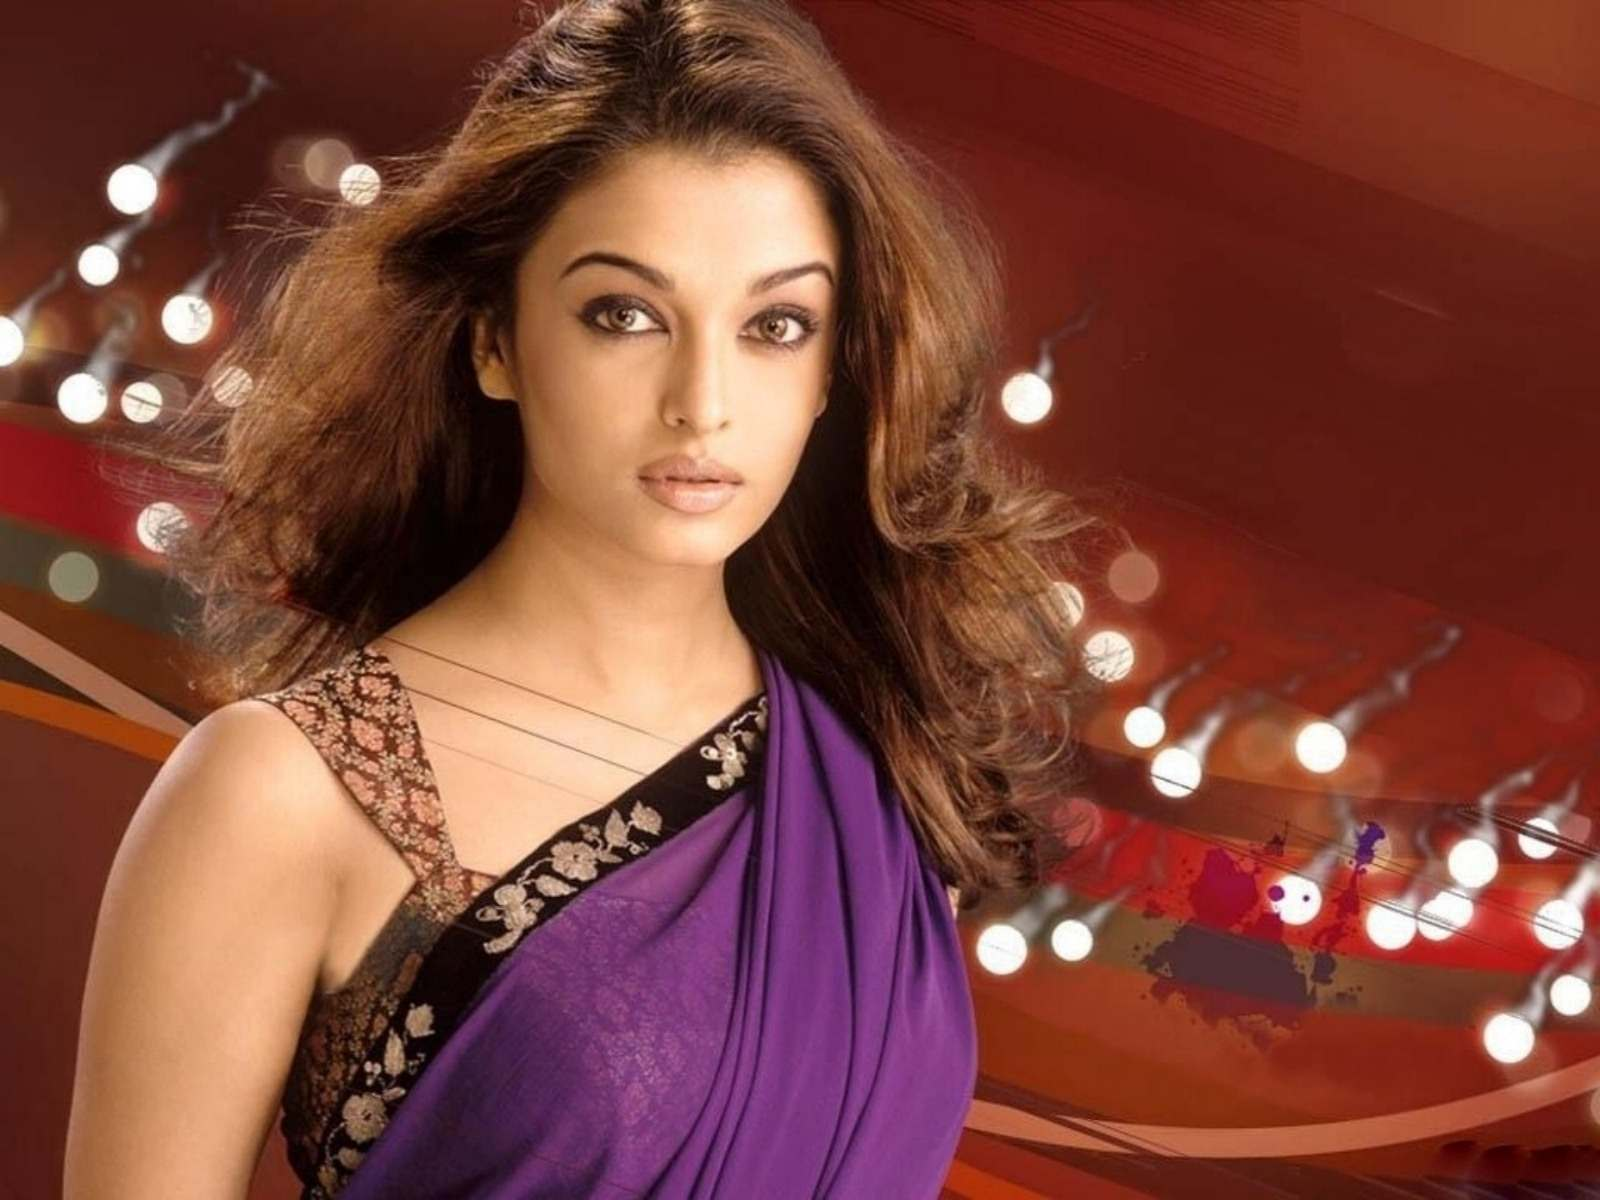 Wallpaper download bollywood actors - Free Download Aishwarya Rai Hd Wallpapers And Images